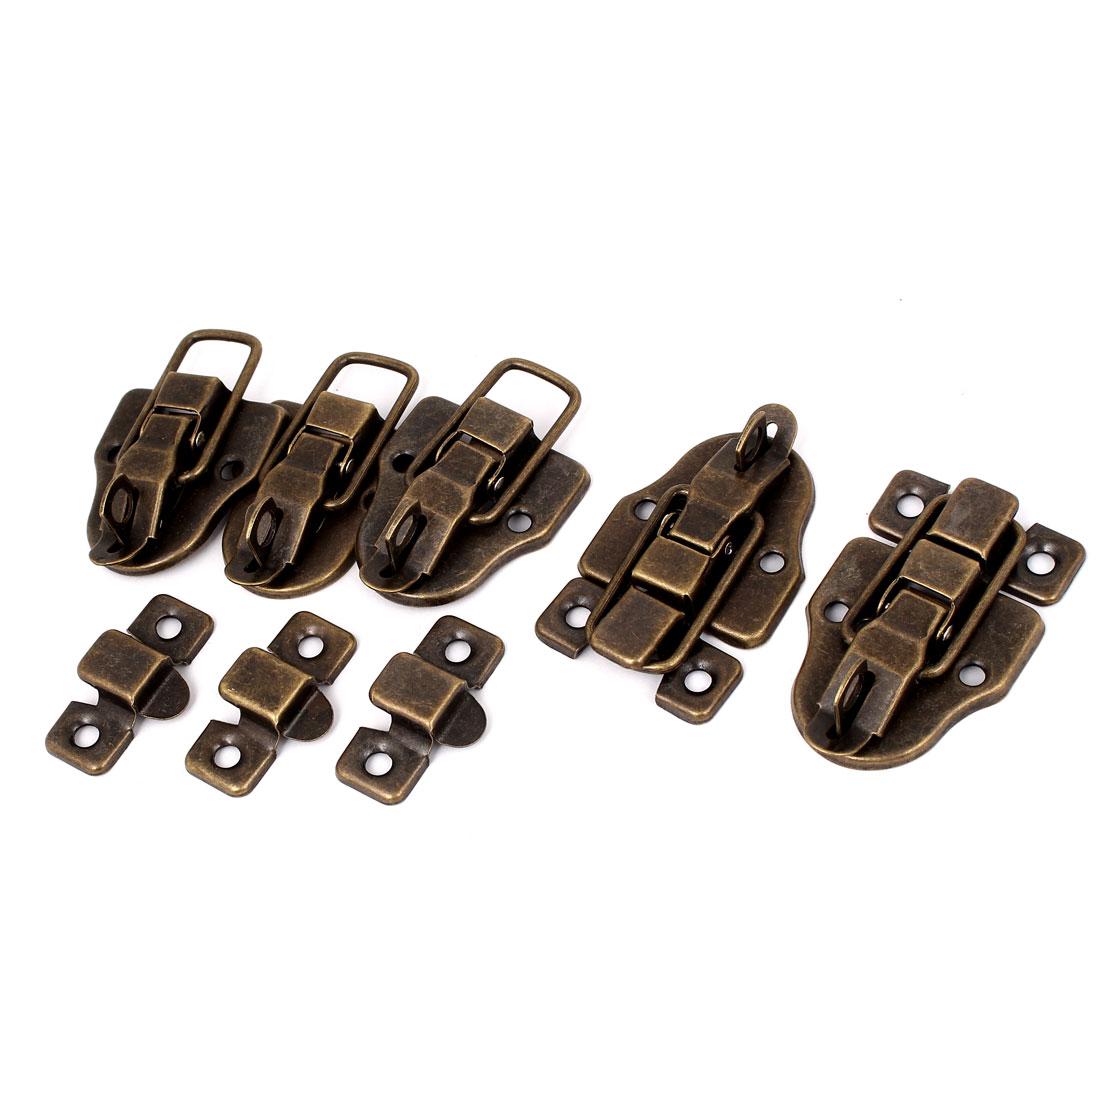 Retro Style Metal Wardrobe Box Case Safe Lock Toggle Latch Hasp Bronze Tone 5pcs